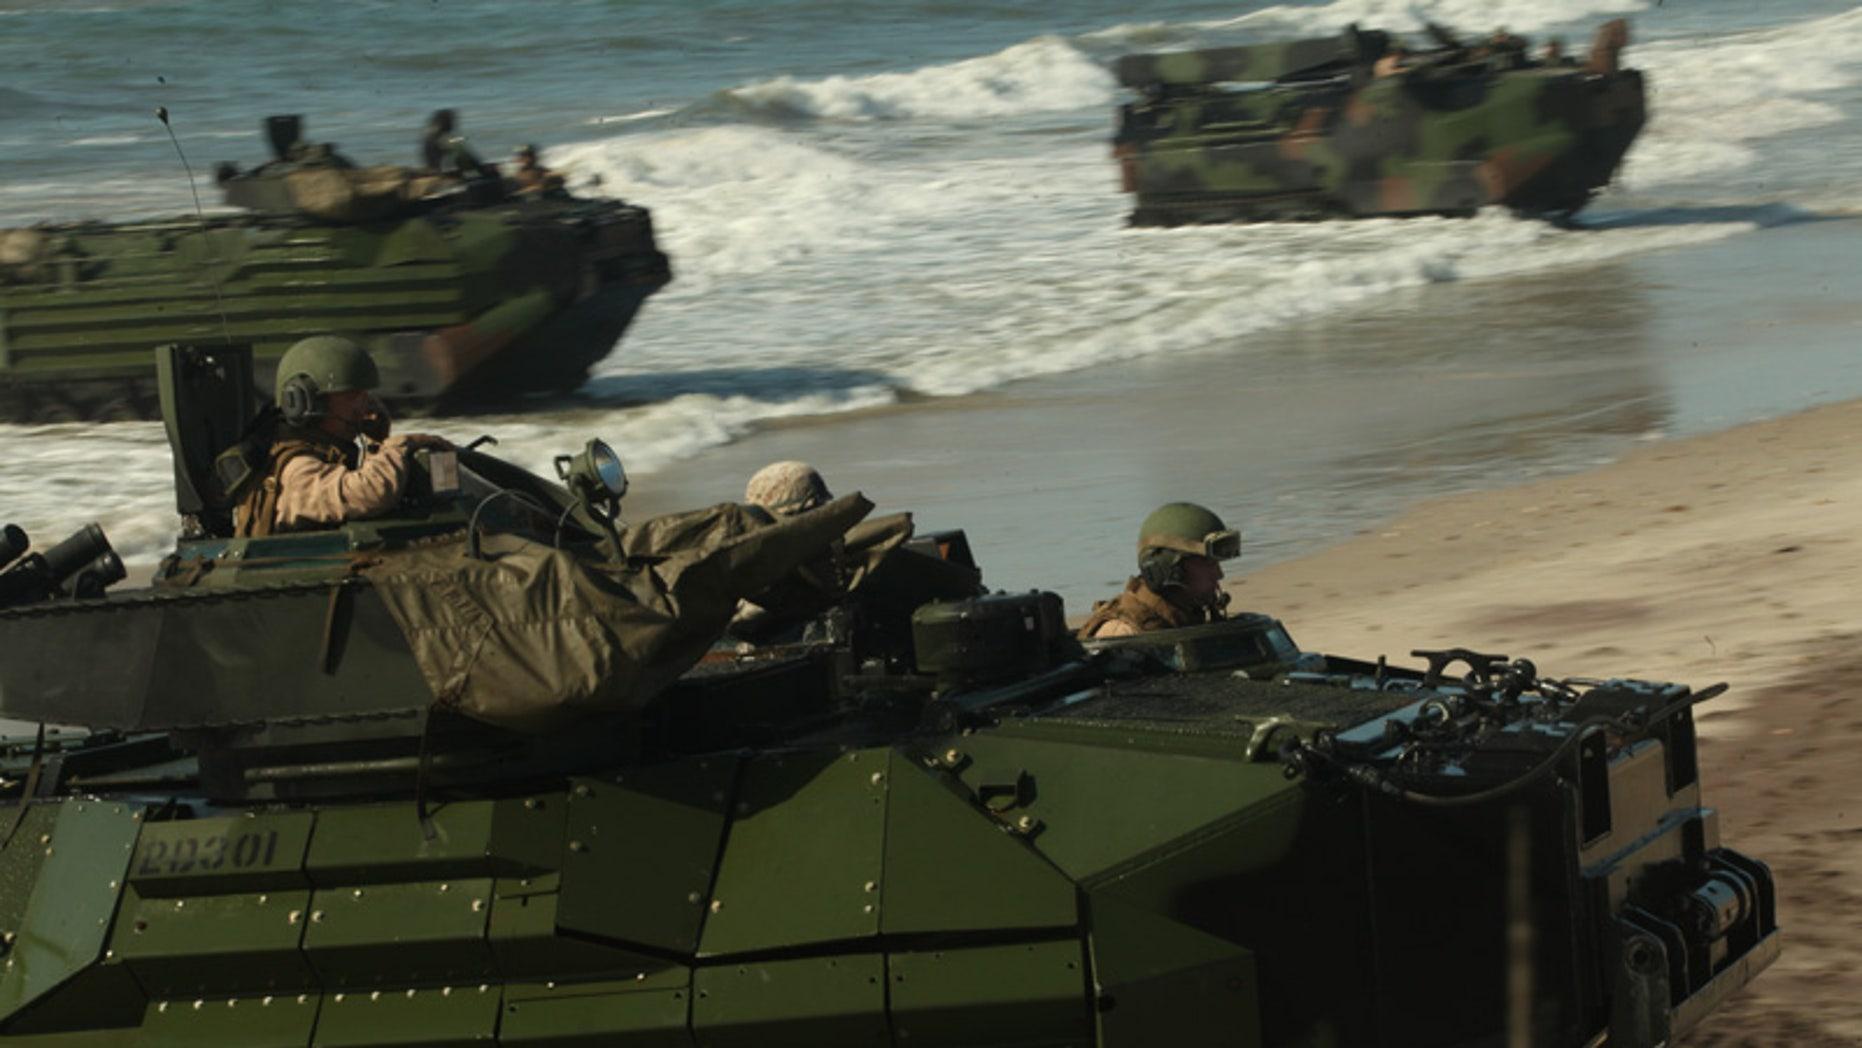 May 9, 2012: U.S. Marines make landfall during on Onslow Beach, Camp Lejeune, N.C.